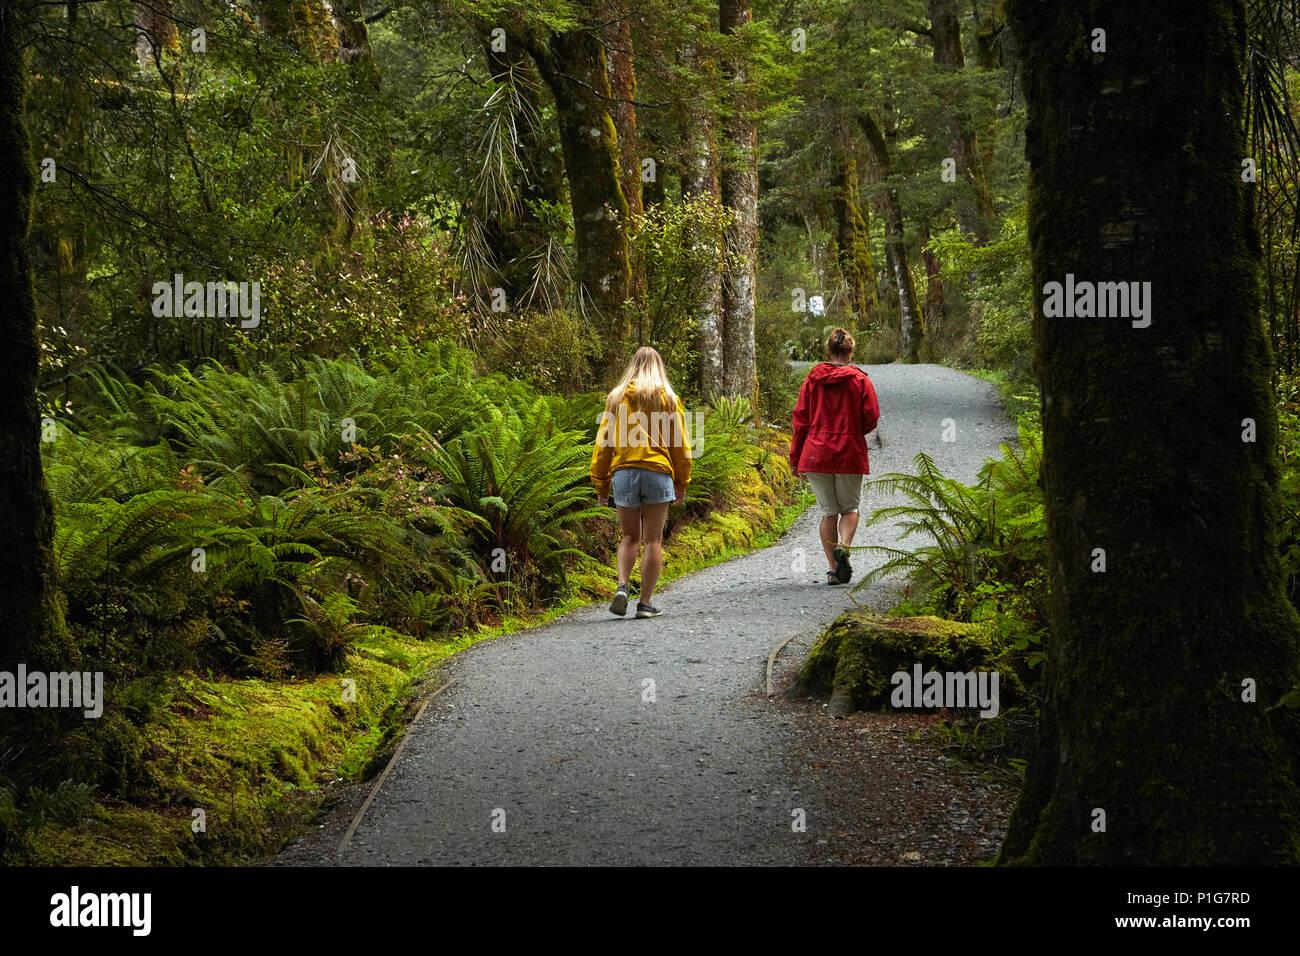 Anschluss an den blauen Pools, Mount Aspiring National Park, den Haast Pass, in der Nähe der Makarora, Otago, Südinsel, Neuseeland (Model Released) Stockbild